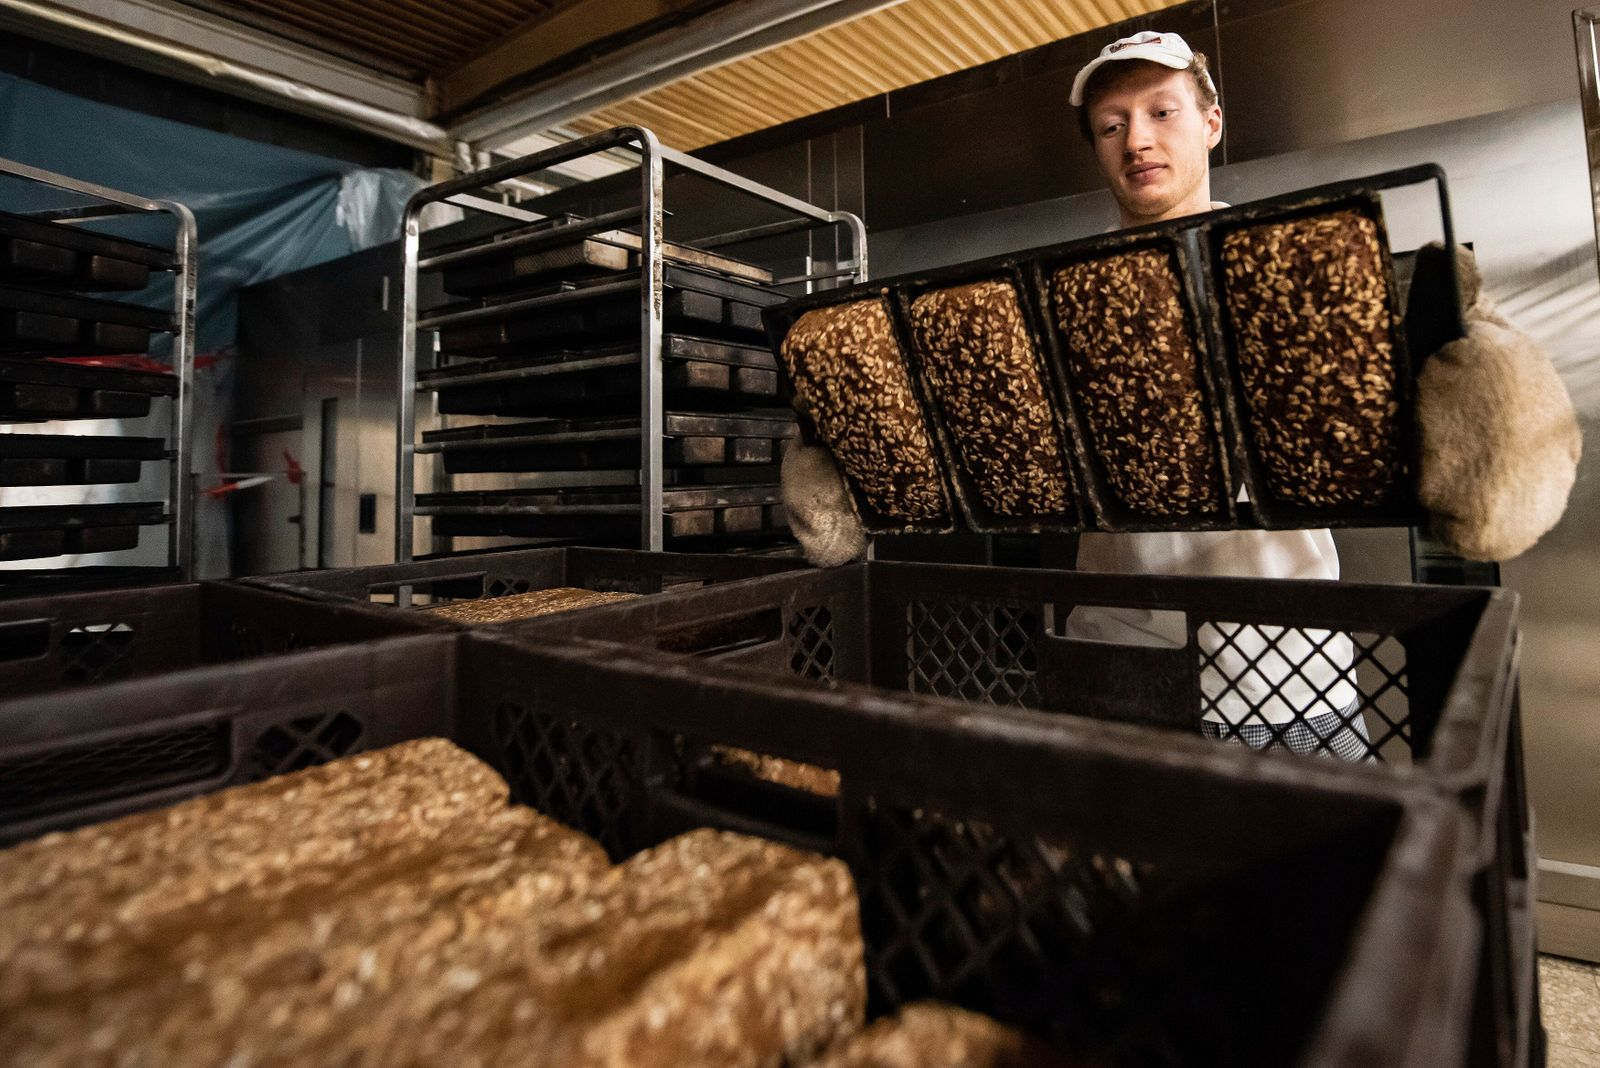 Bäcker in Niedersachsen